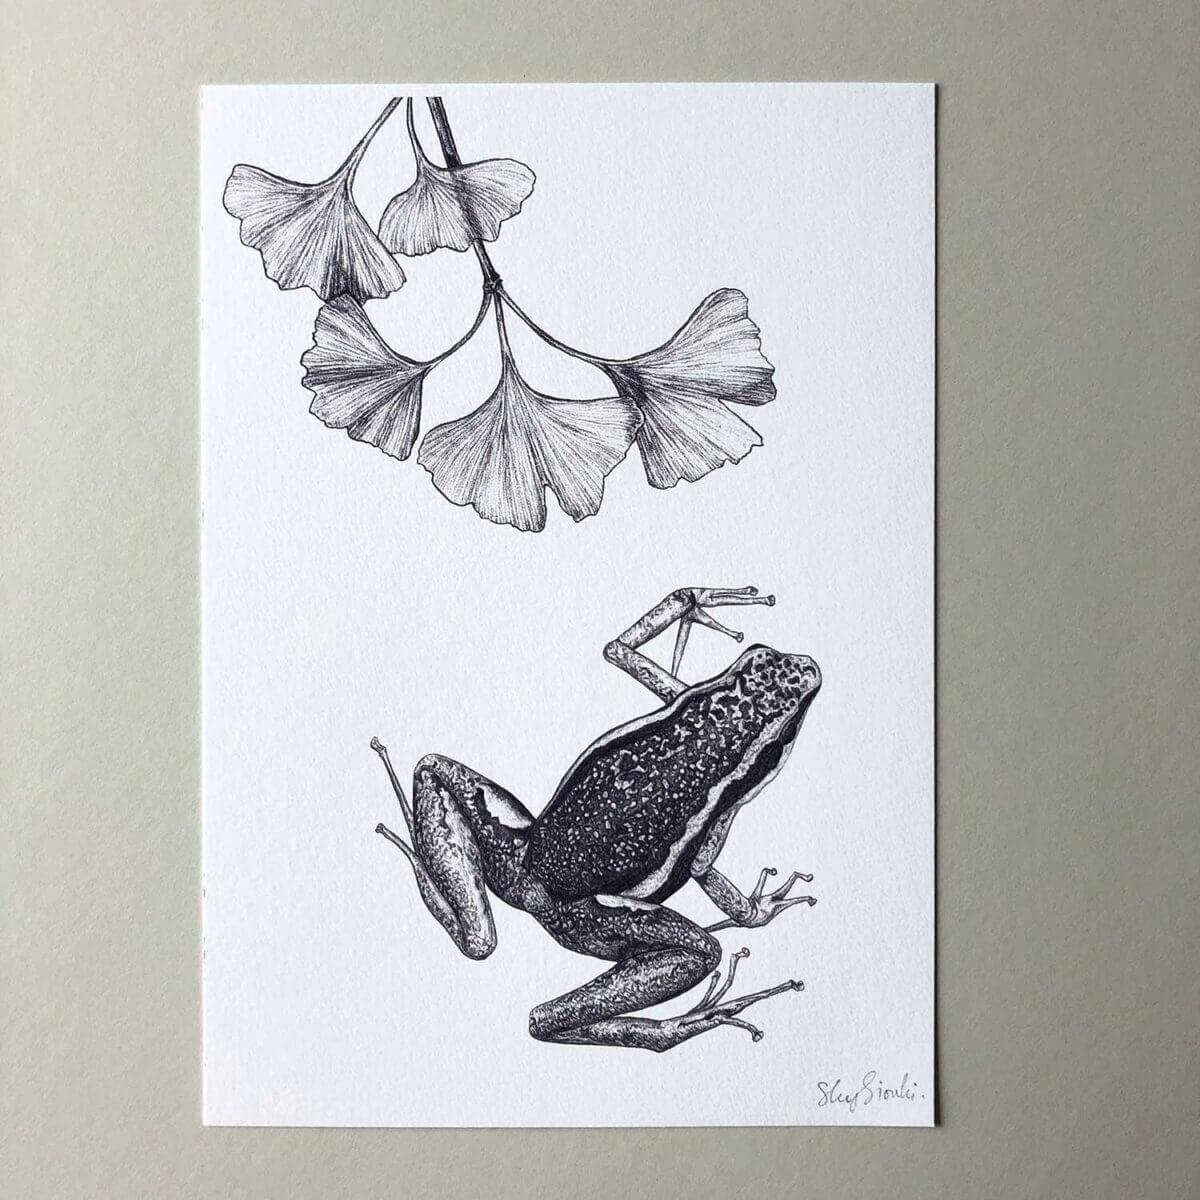 Poison-Dart-Frog-Print-Flat-Sky-Siouki